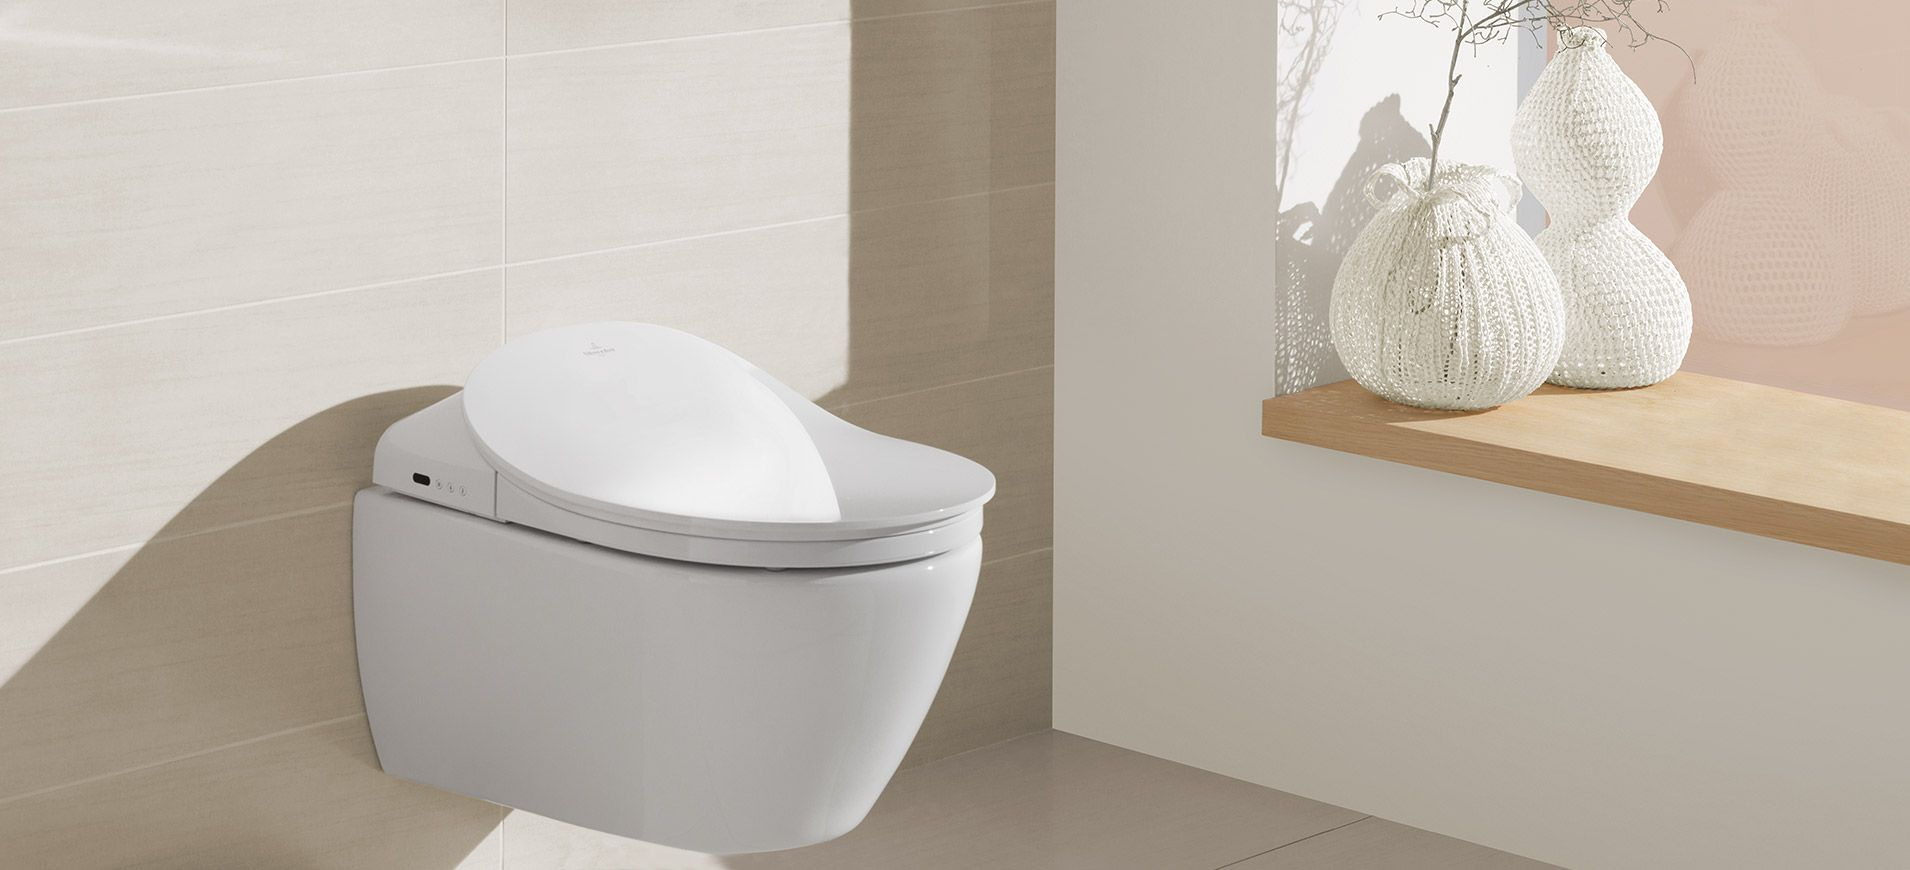 Villeroy & Boch Viclean Bathroom chair, Bathroom